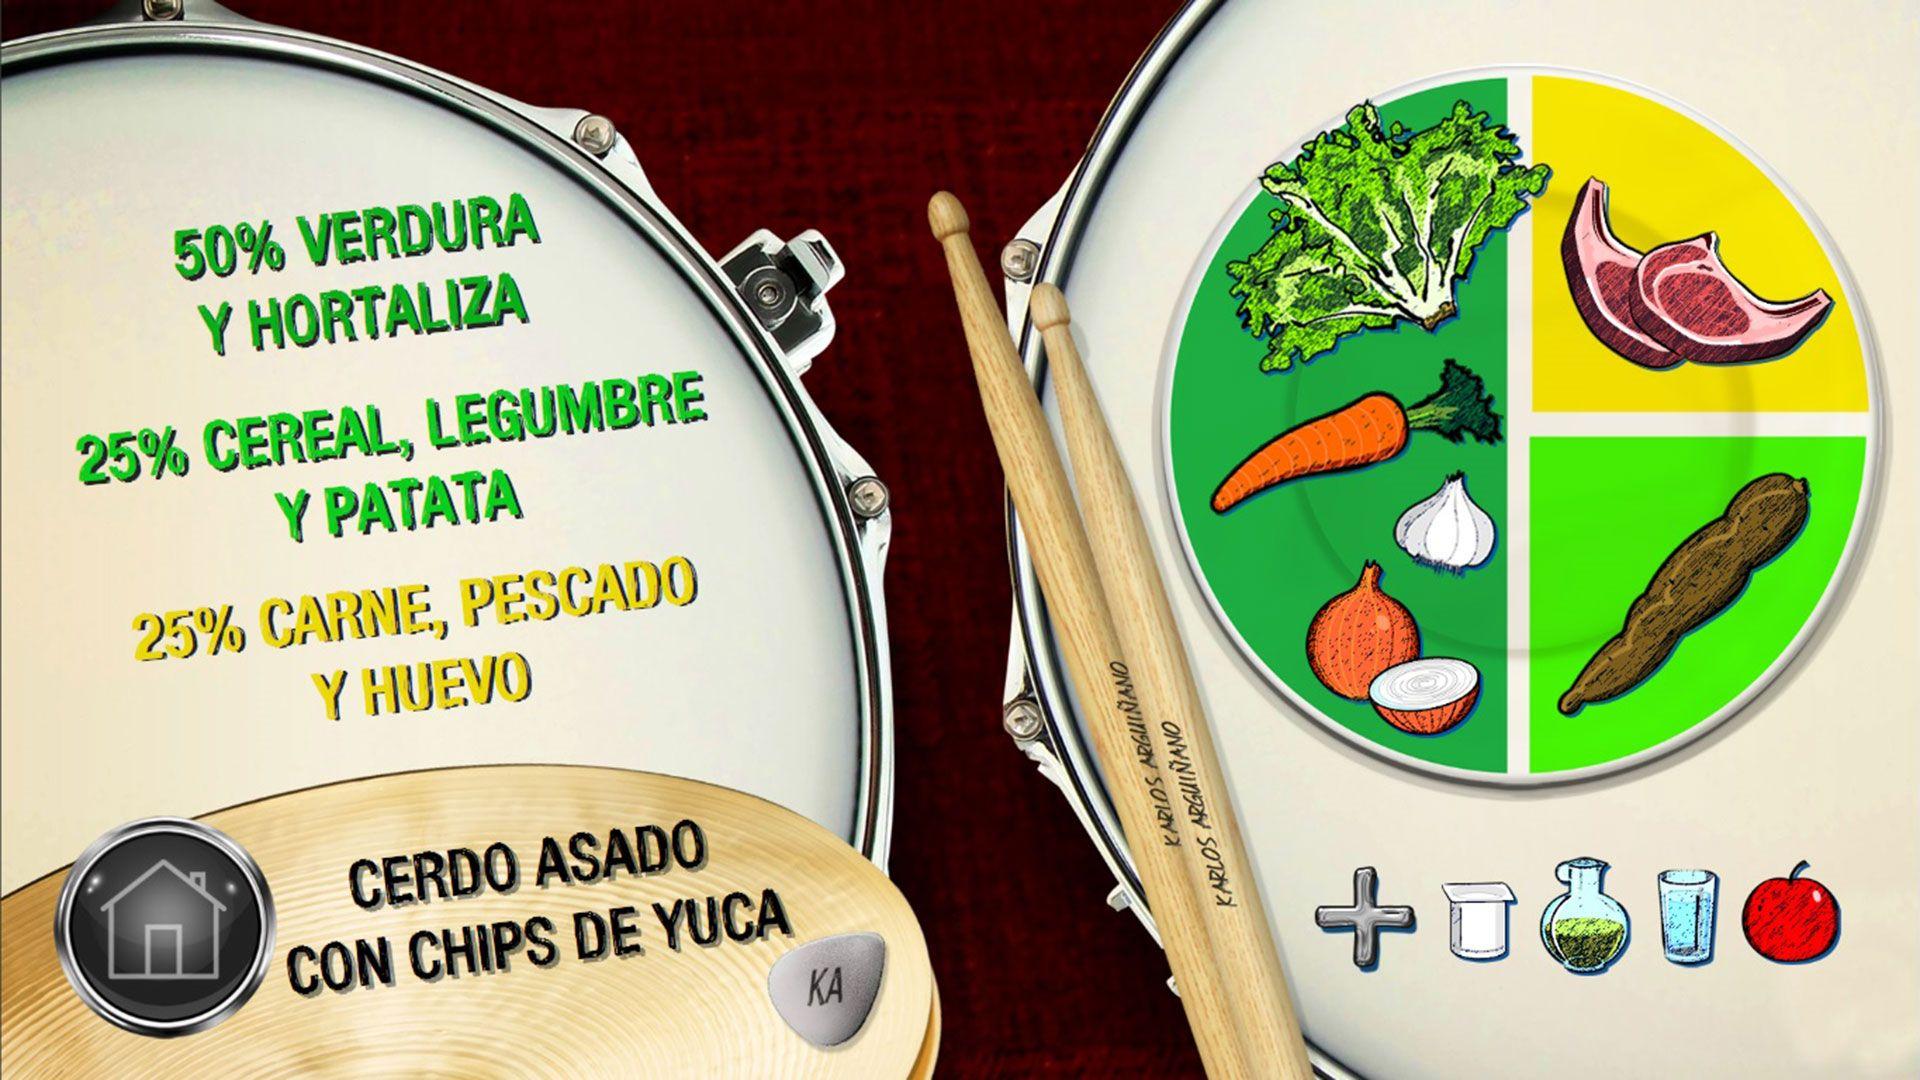 Plato equilibrado - Cerdo asado con chips de yuca